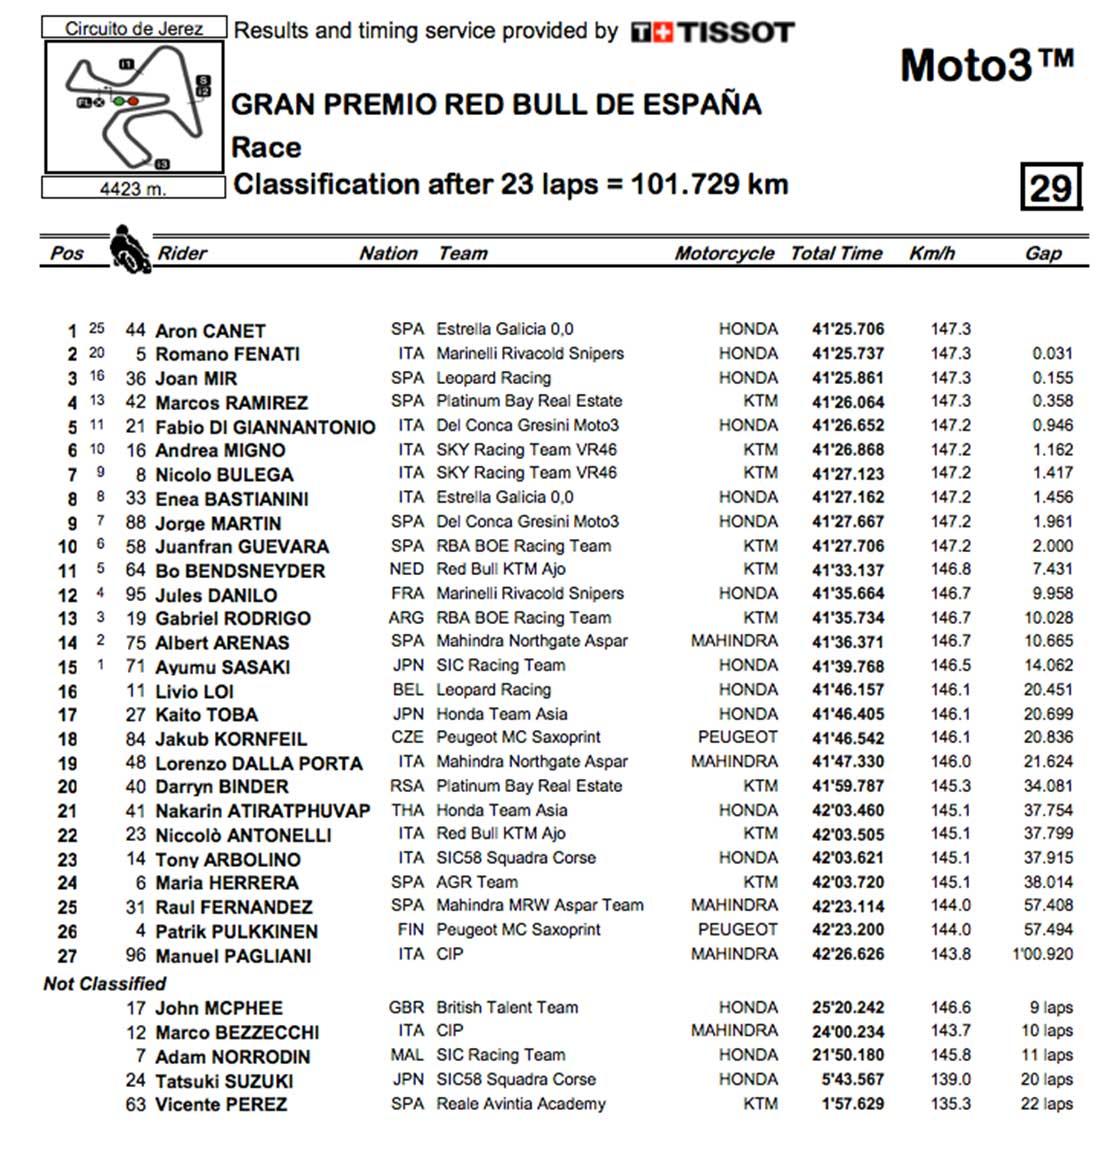 Carrera Moto3 Gran Premio de España 2017